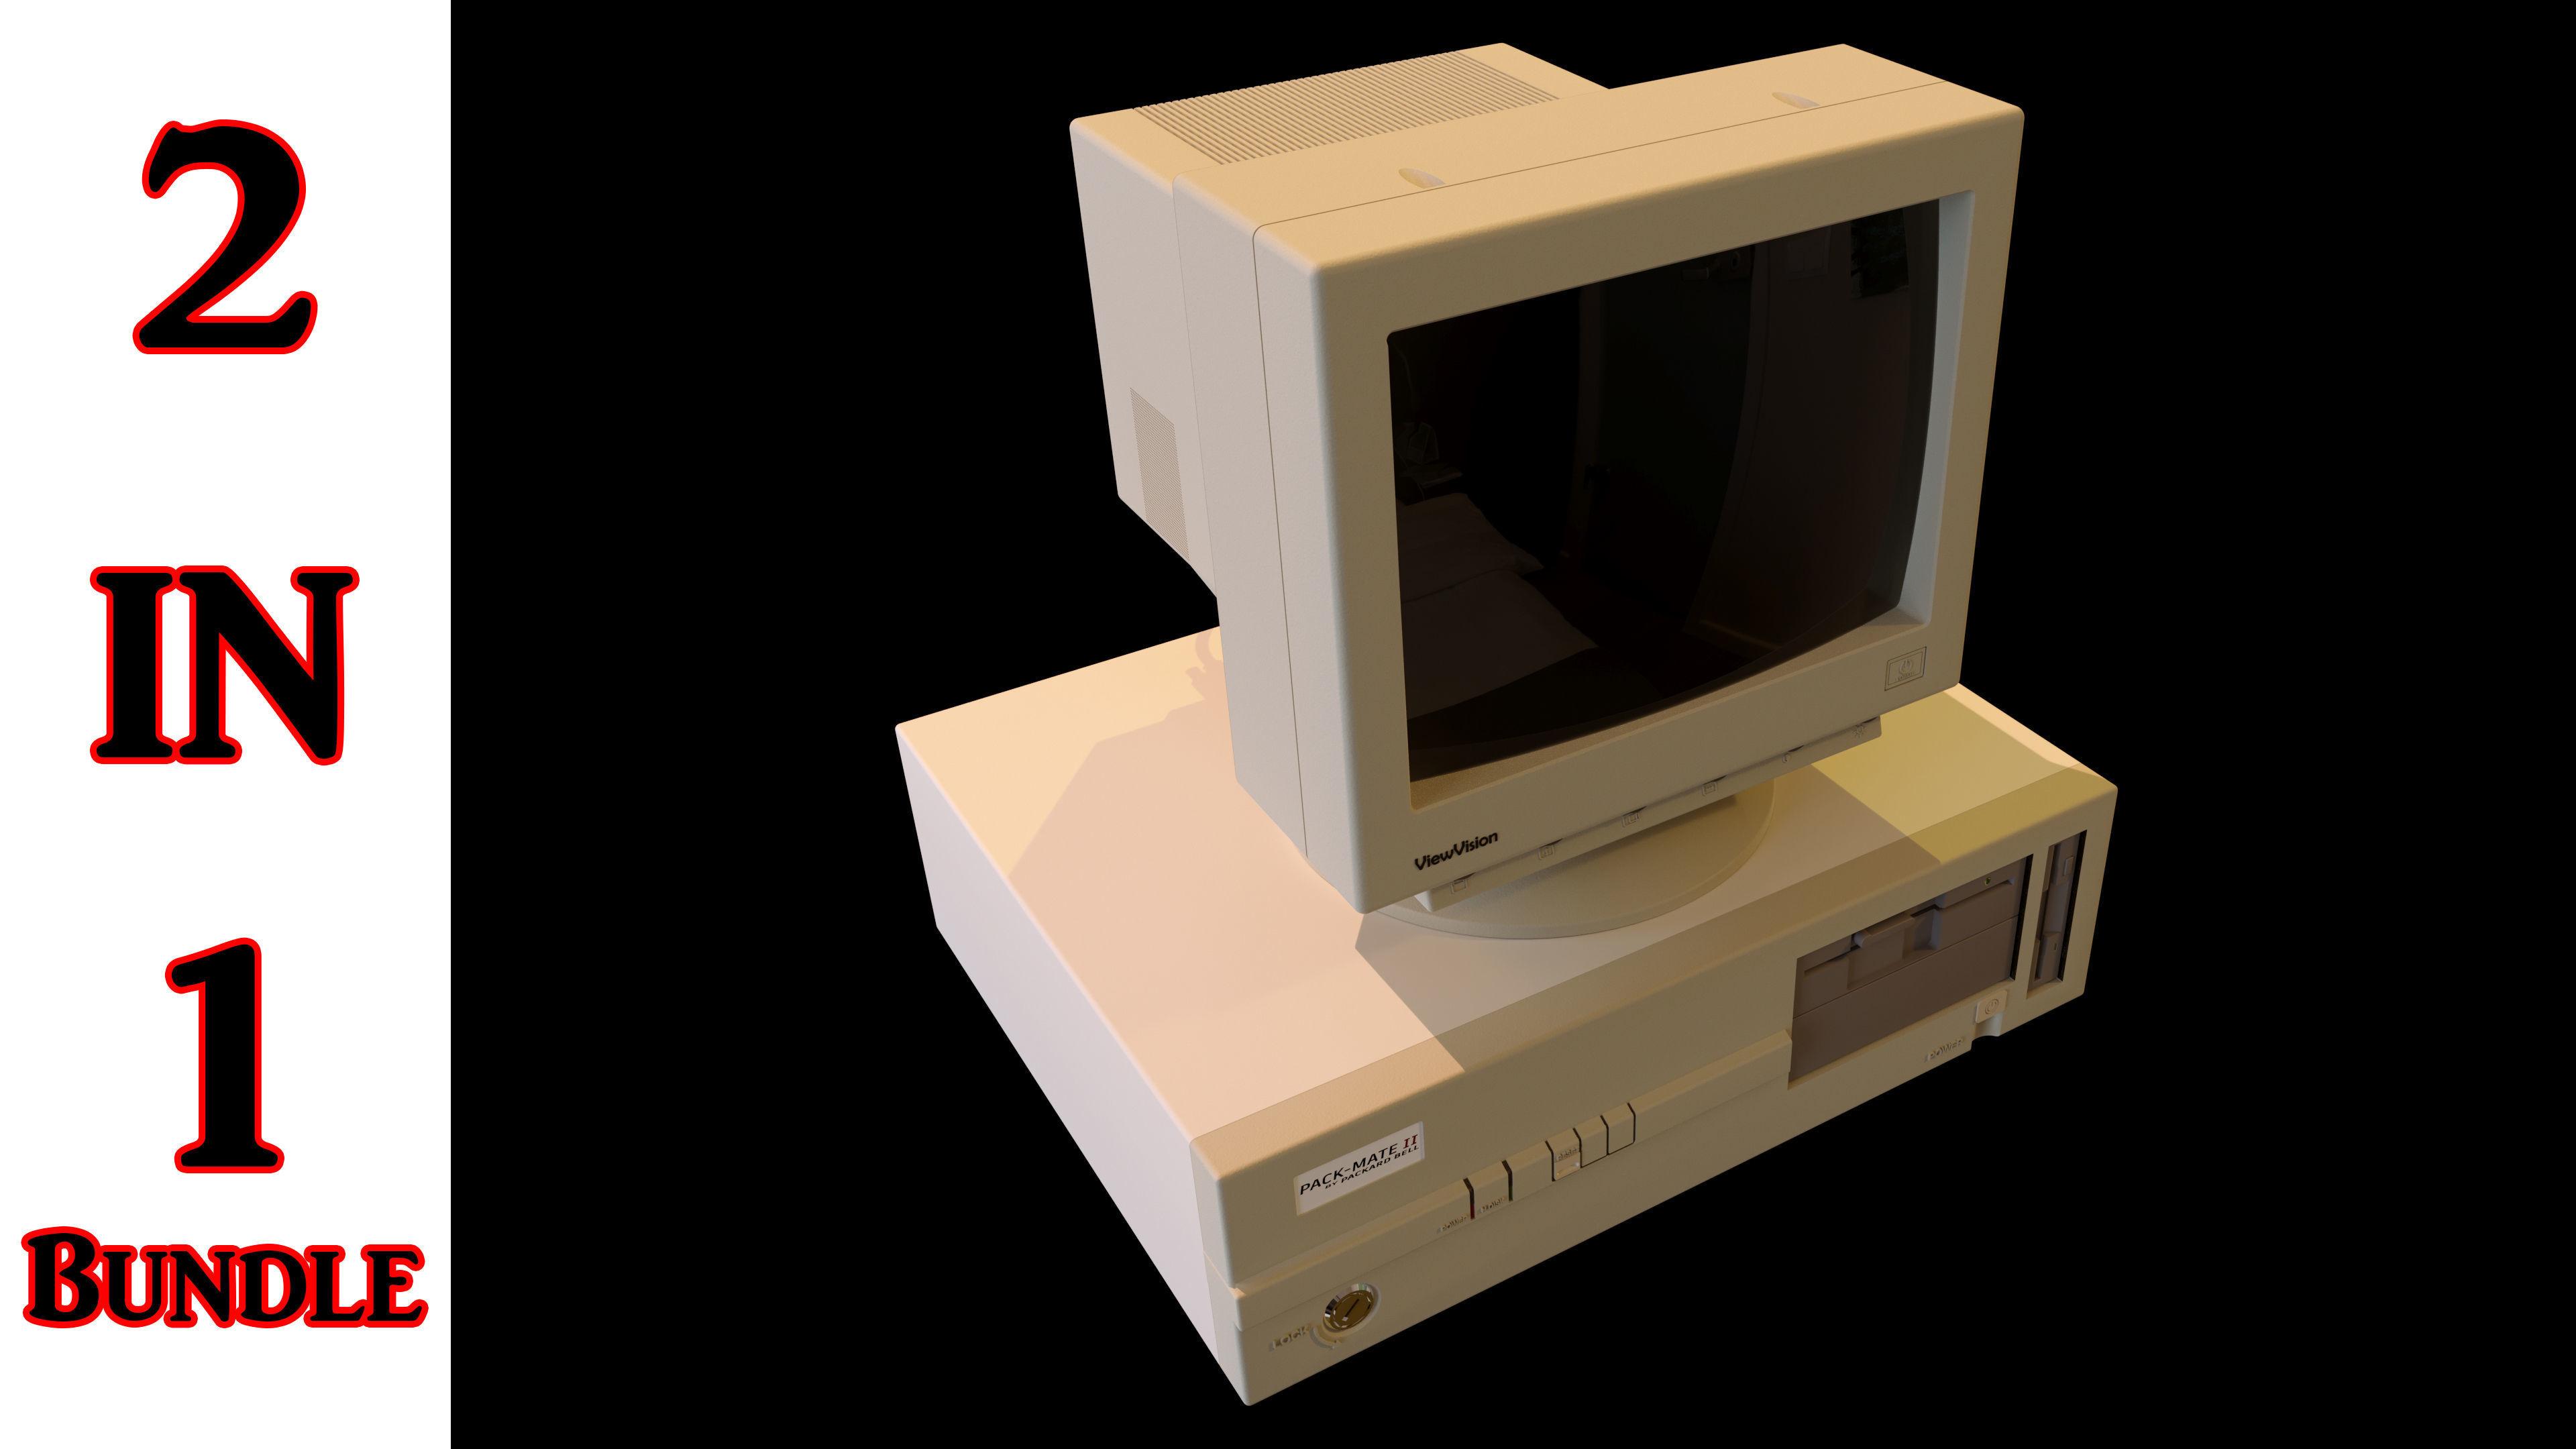 Vintage PC 2 in 1 Bundle